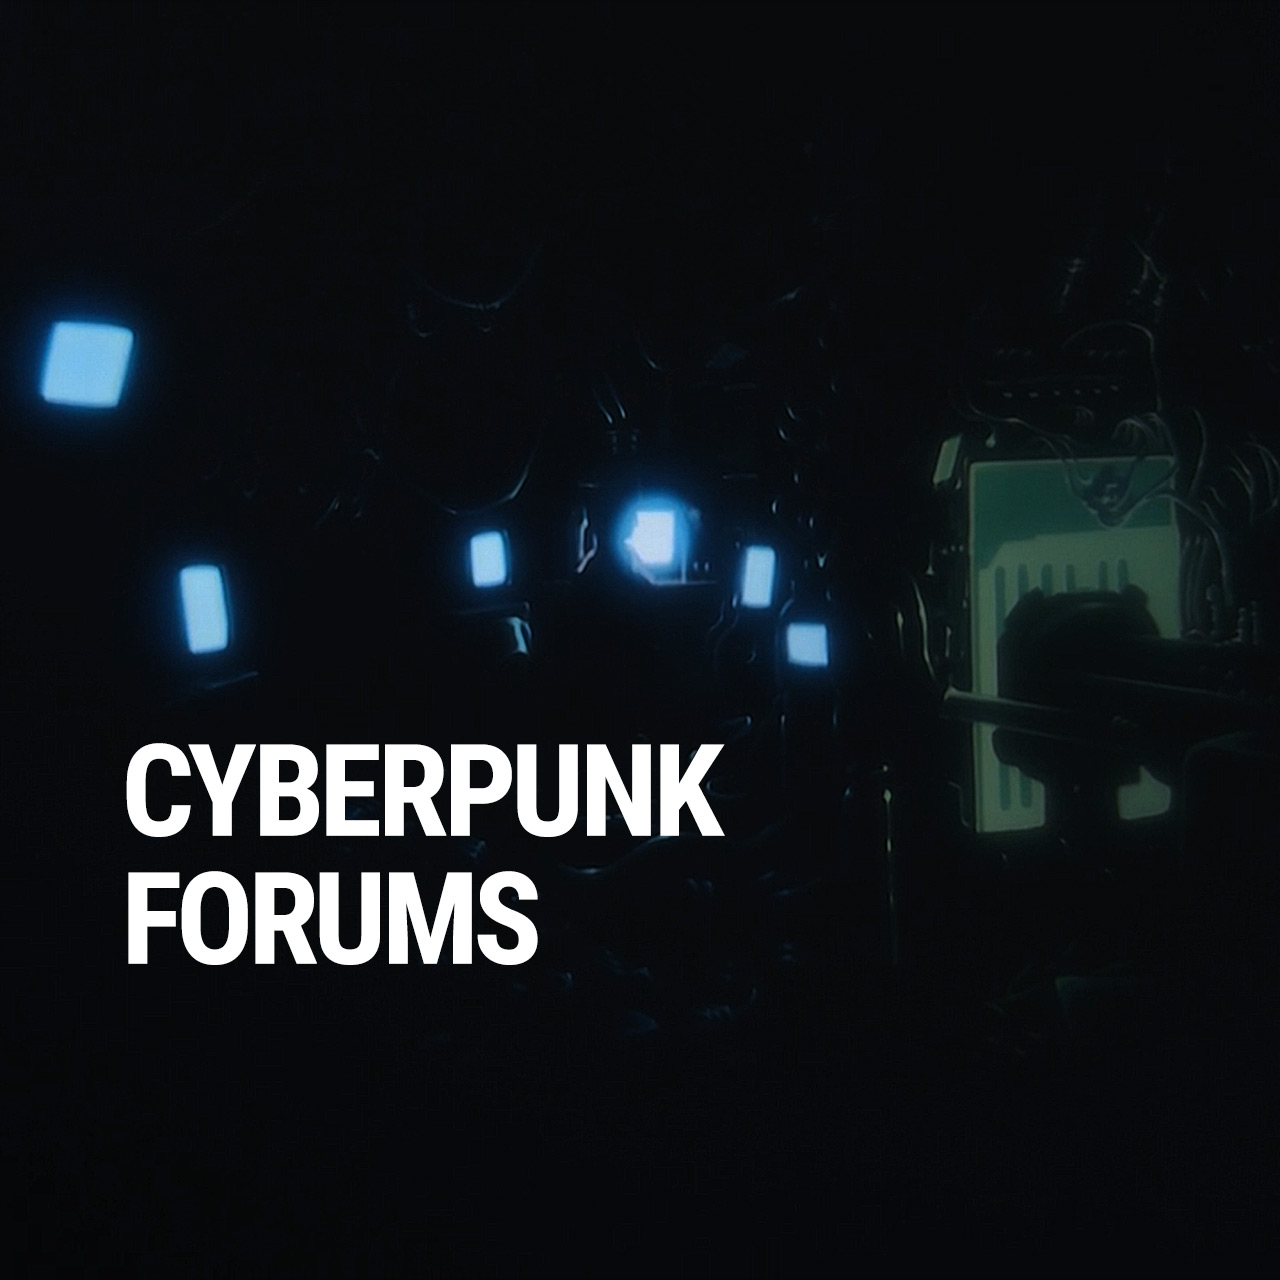 Cyberpunk Forums